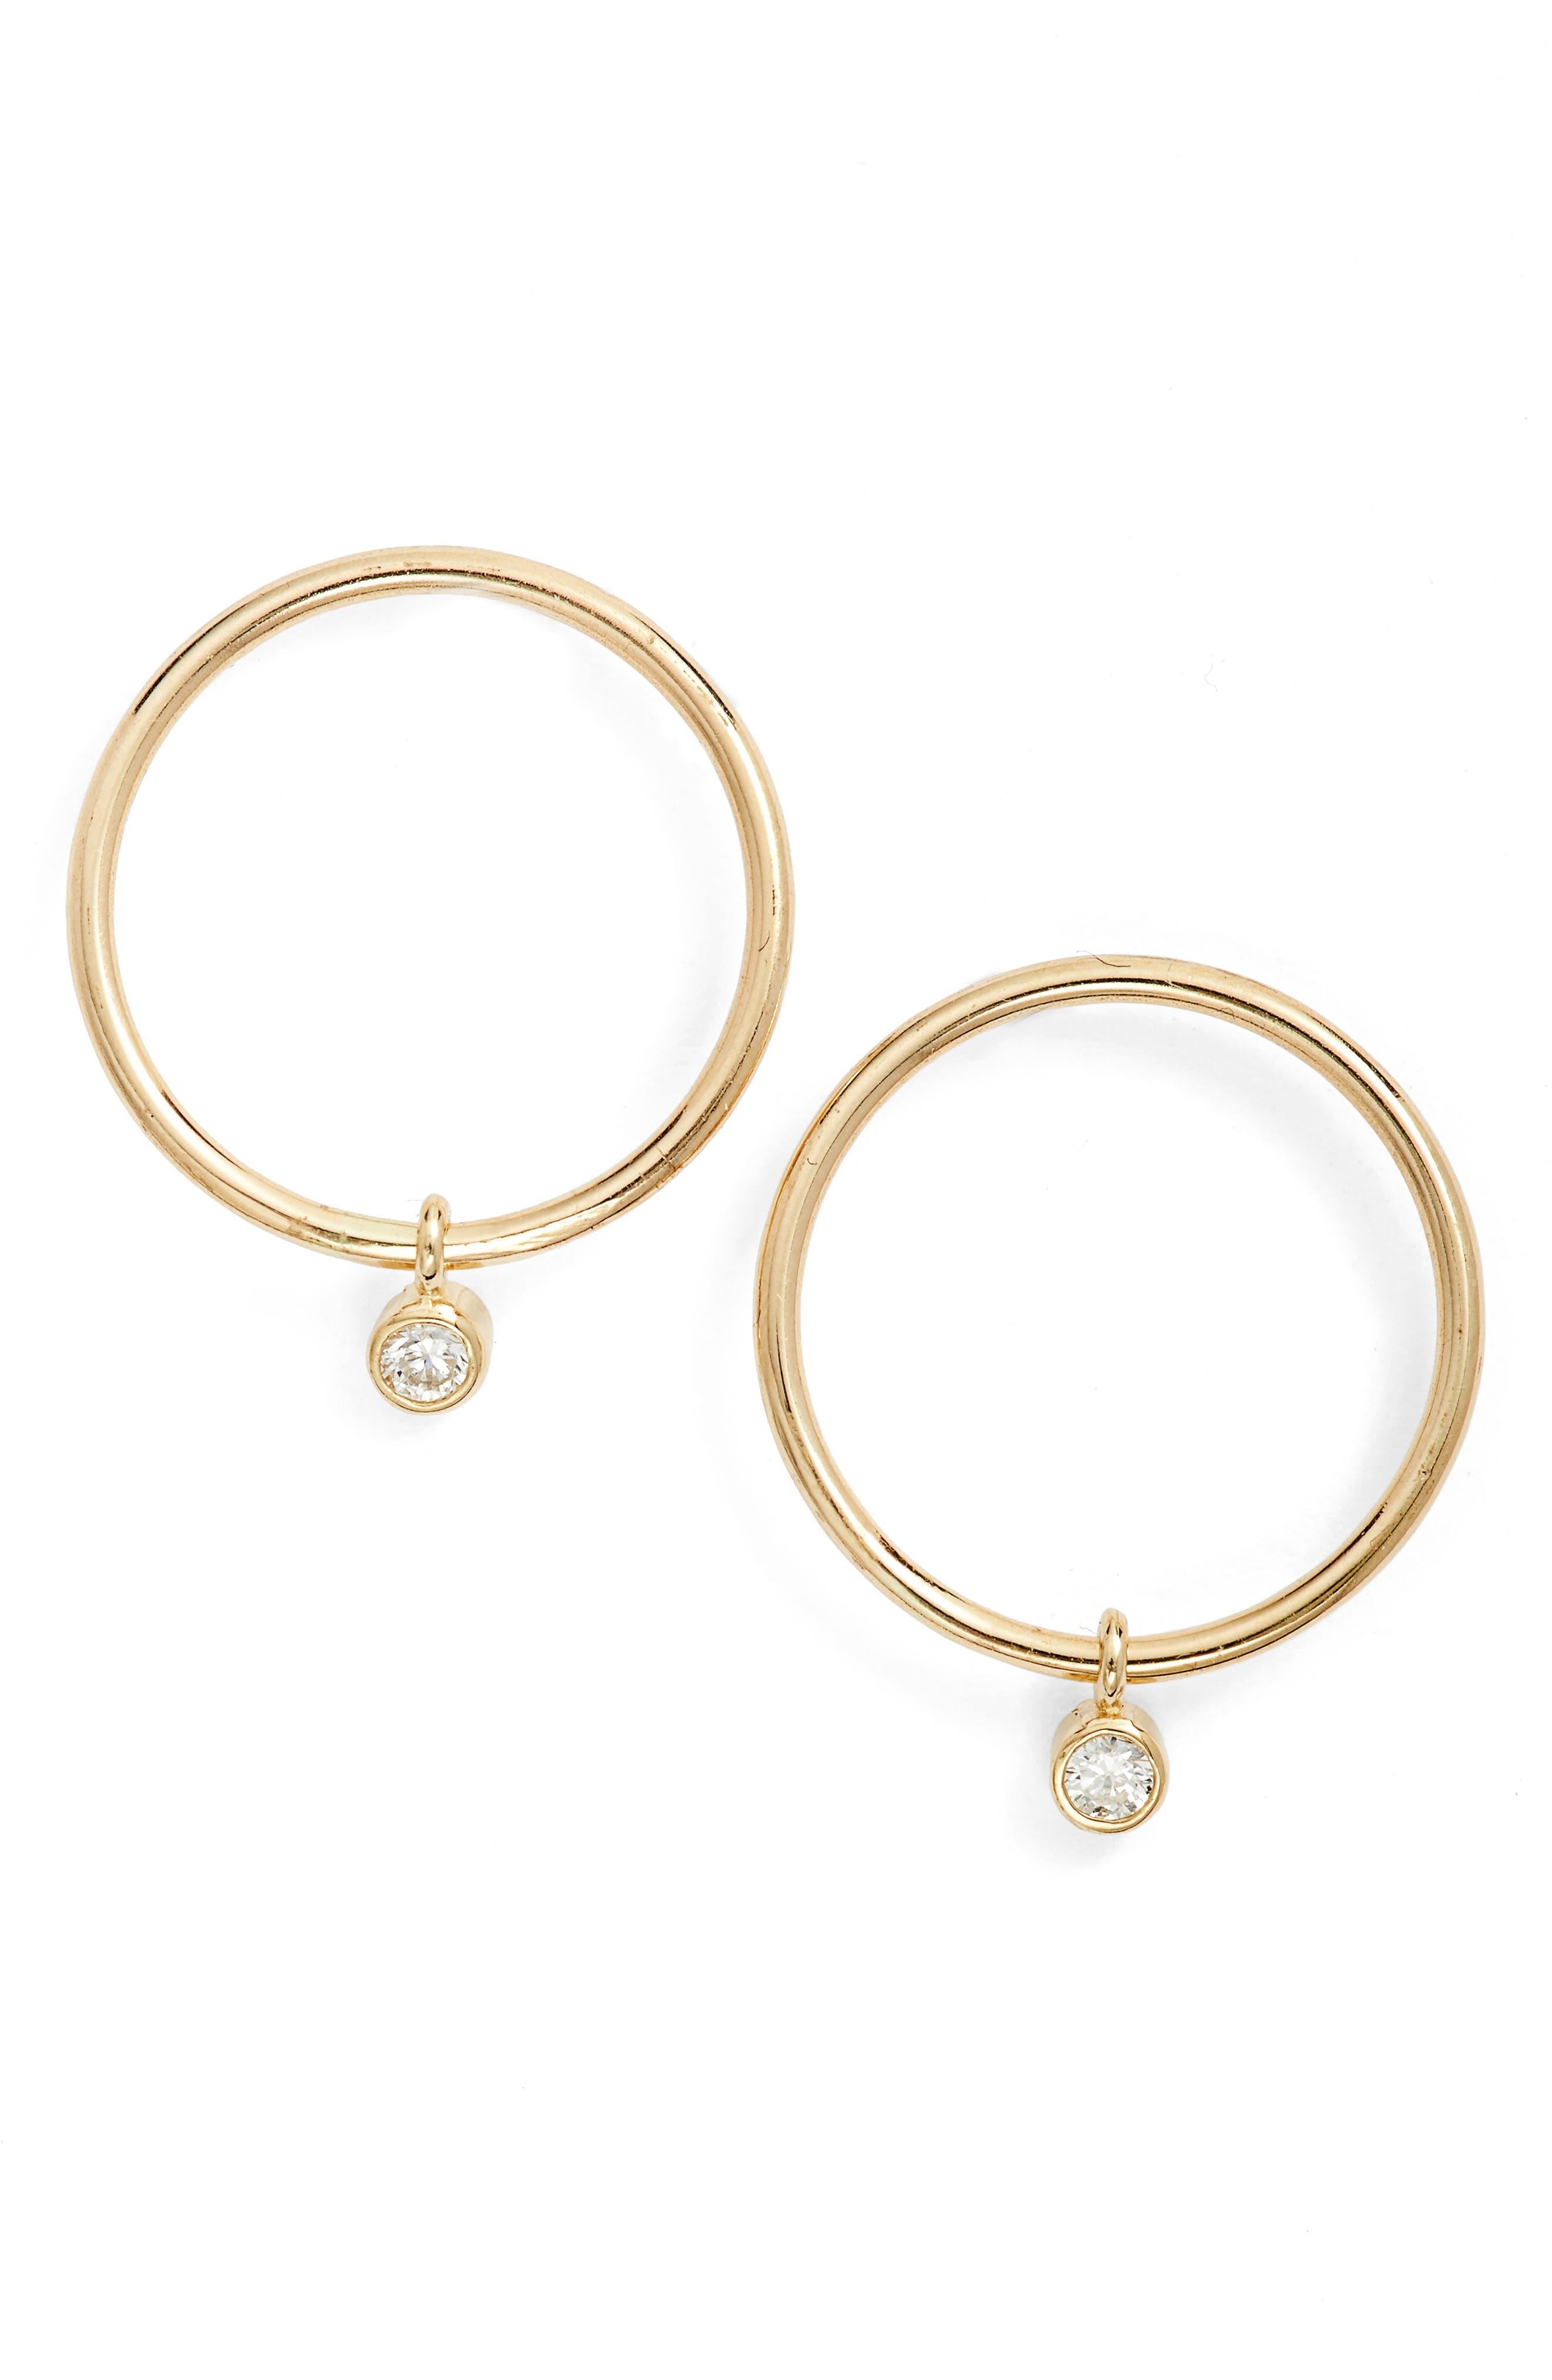 Alternate Image 1 Selected - Zoë Chicco Diamond Small Frontal Hoop Earrings